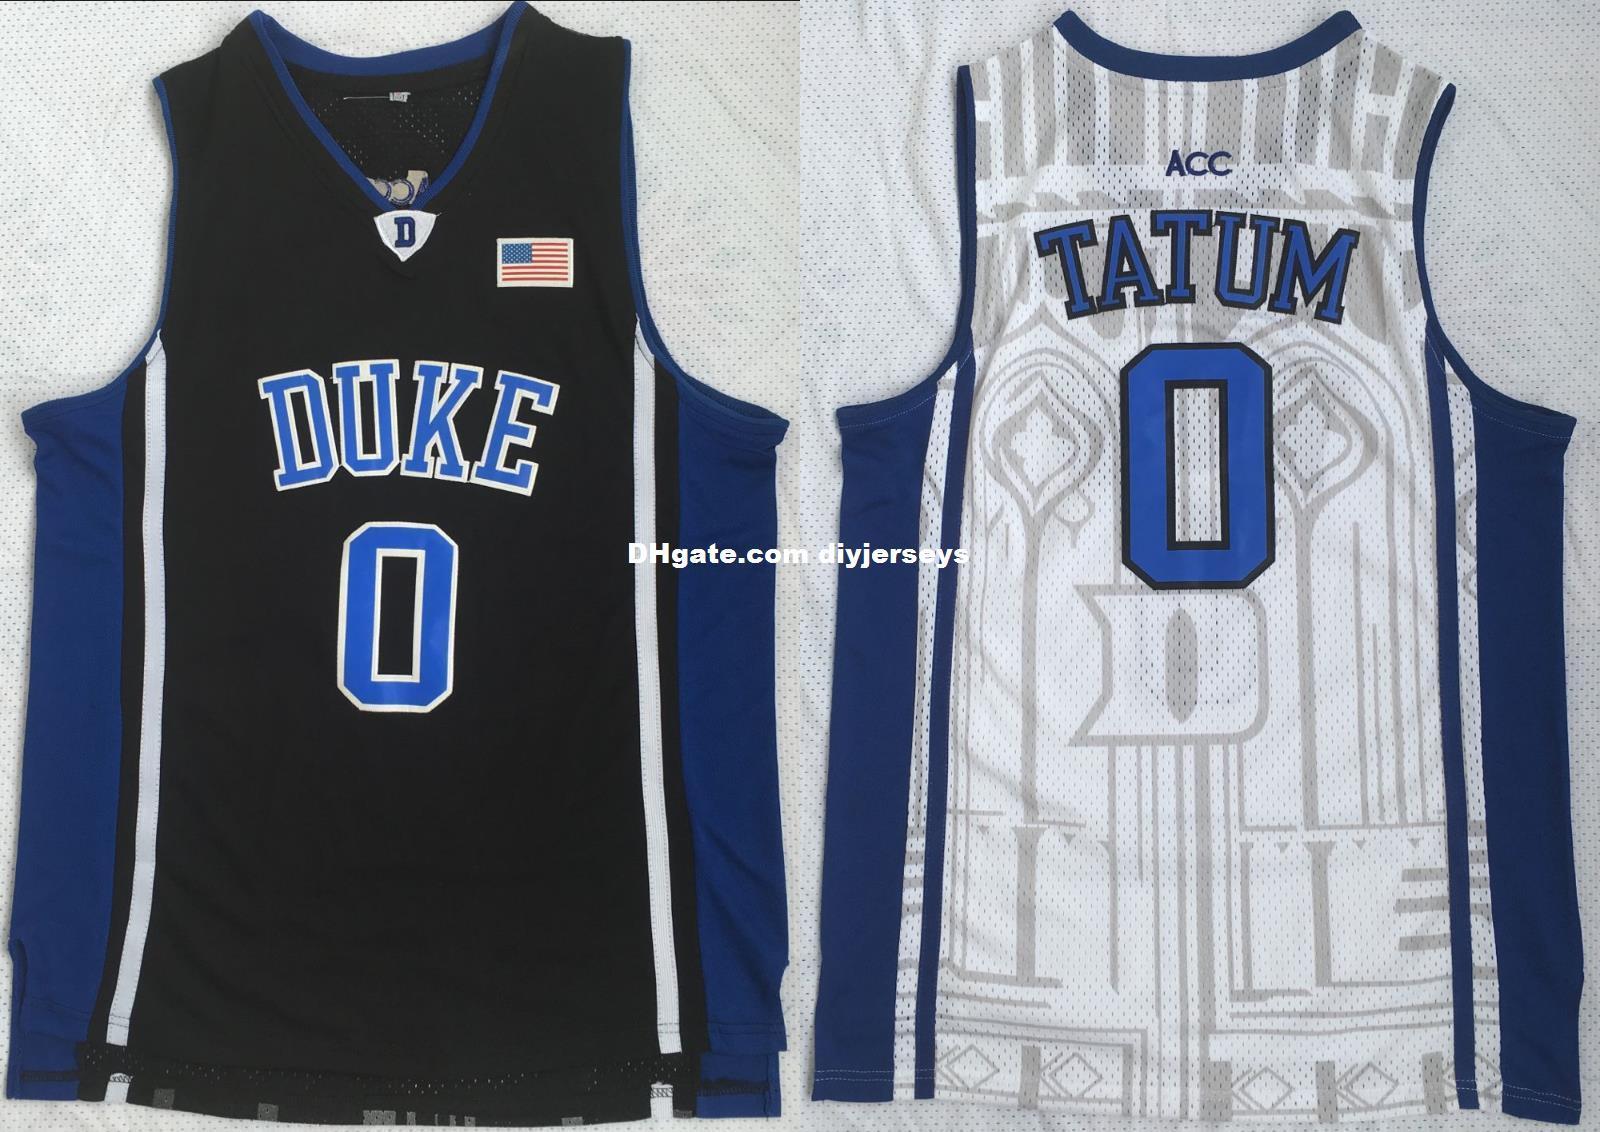 huge discount 0ed0e d2559 Cheap Wholesale Jayson Tatum #0 Duke Blue Devils College Basketball Jerseys  Men Stitched White Black S - XXL